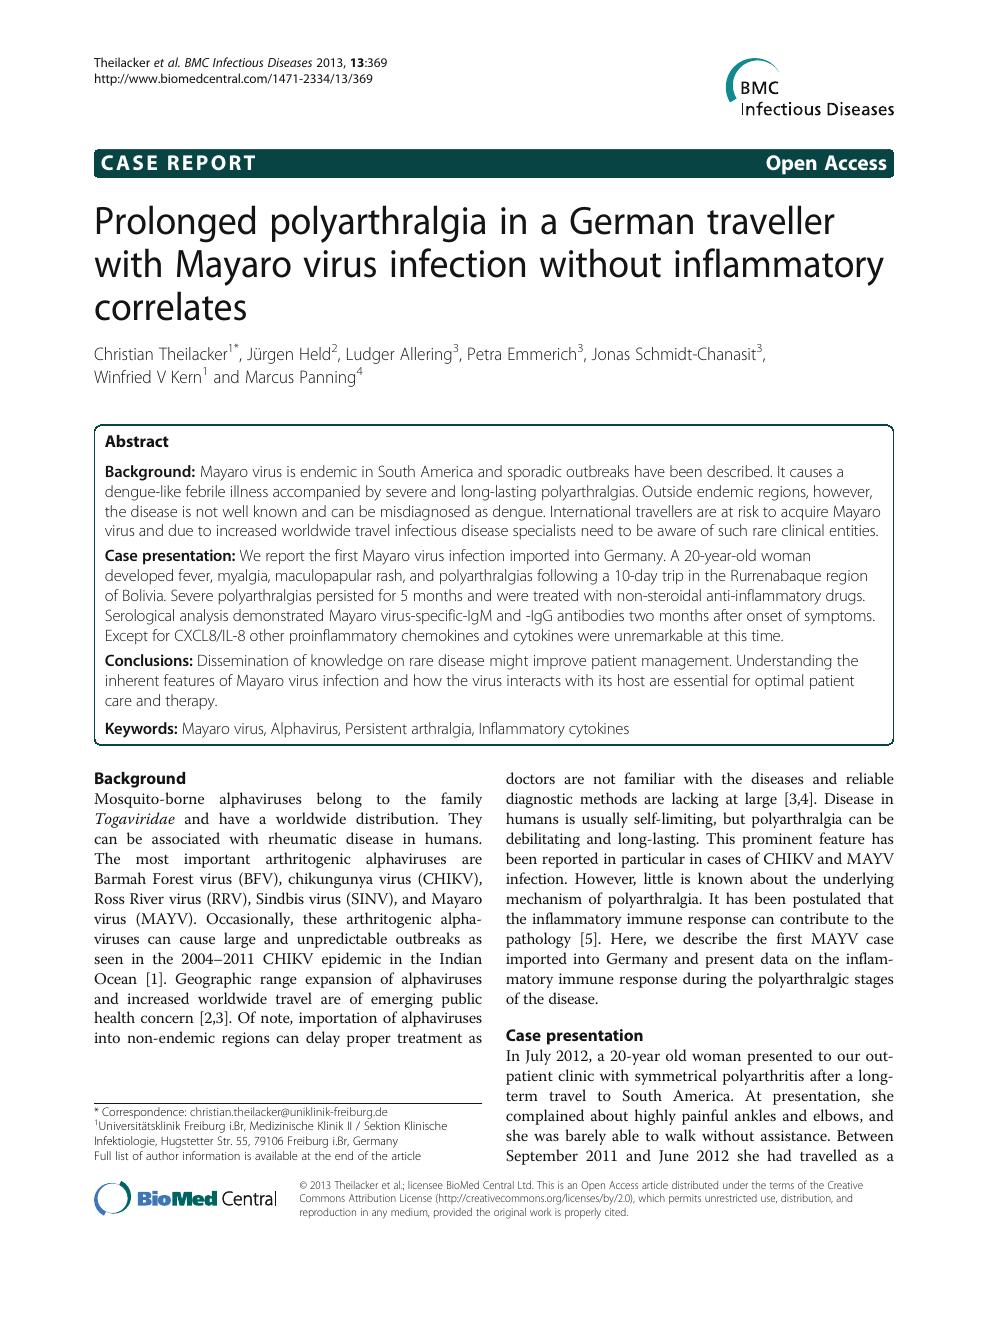 Prolonged polyarthralgia in a German traveller with Mayaro